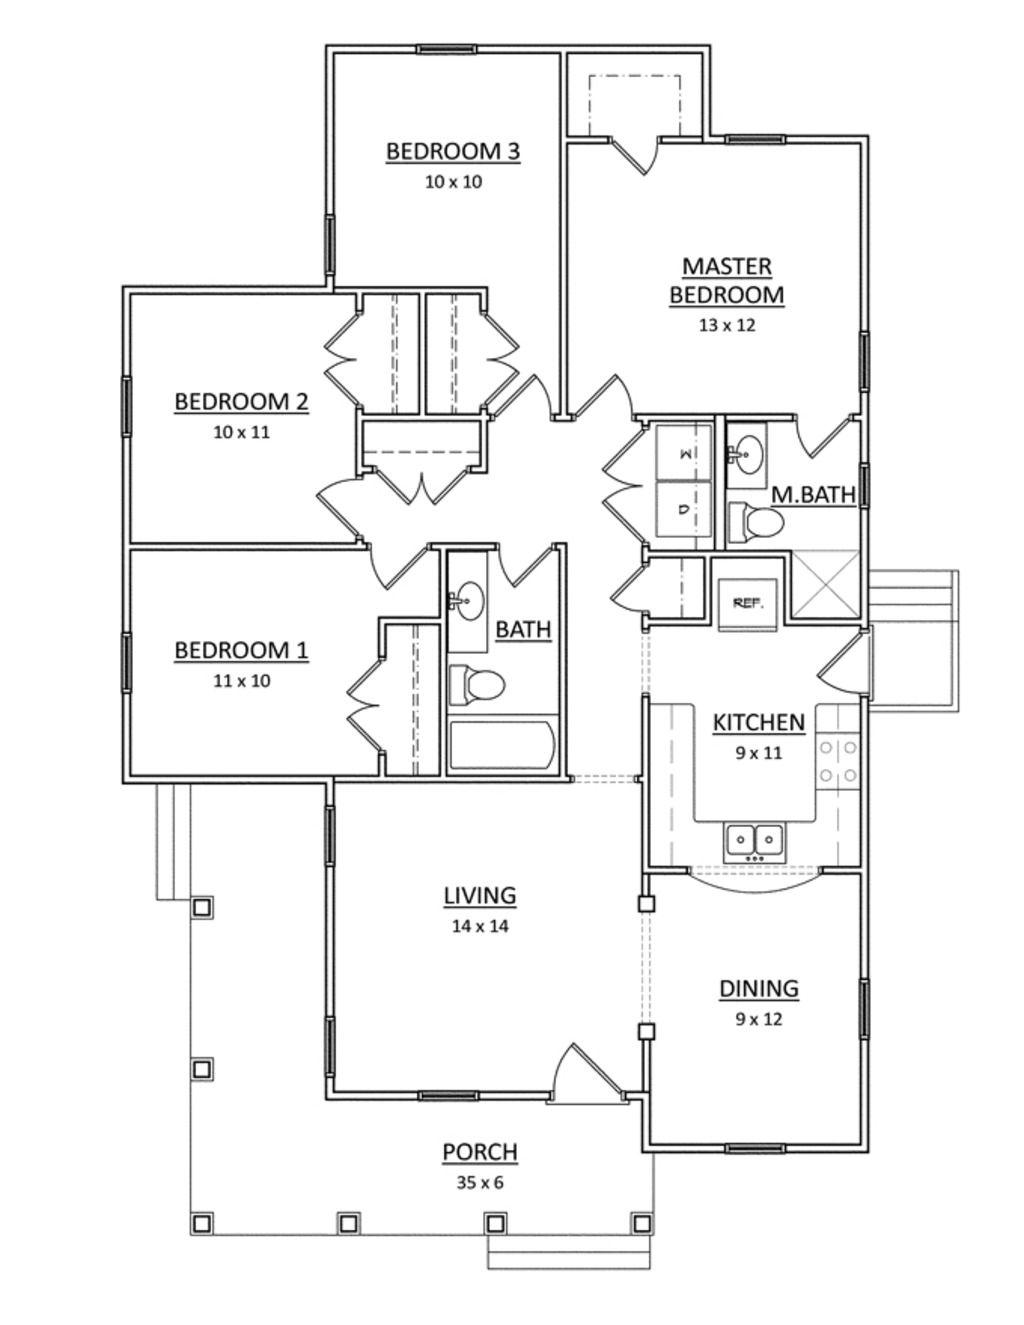 4 Bedroom Bungalow Design Amazing Floor Plan  Main Floor Plan  House Plans  Pinterest  Craftsman Design Ideas